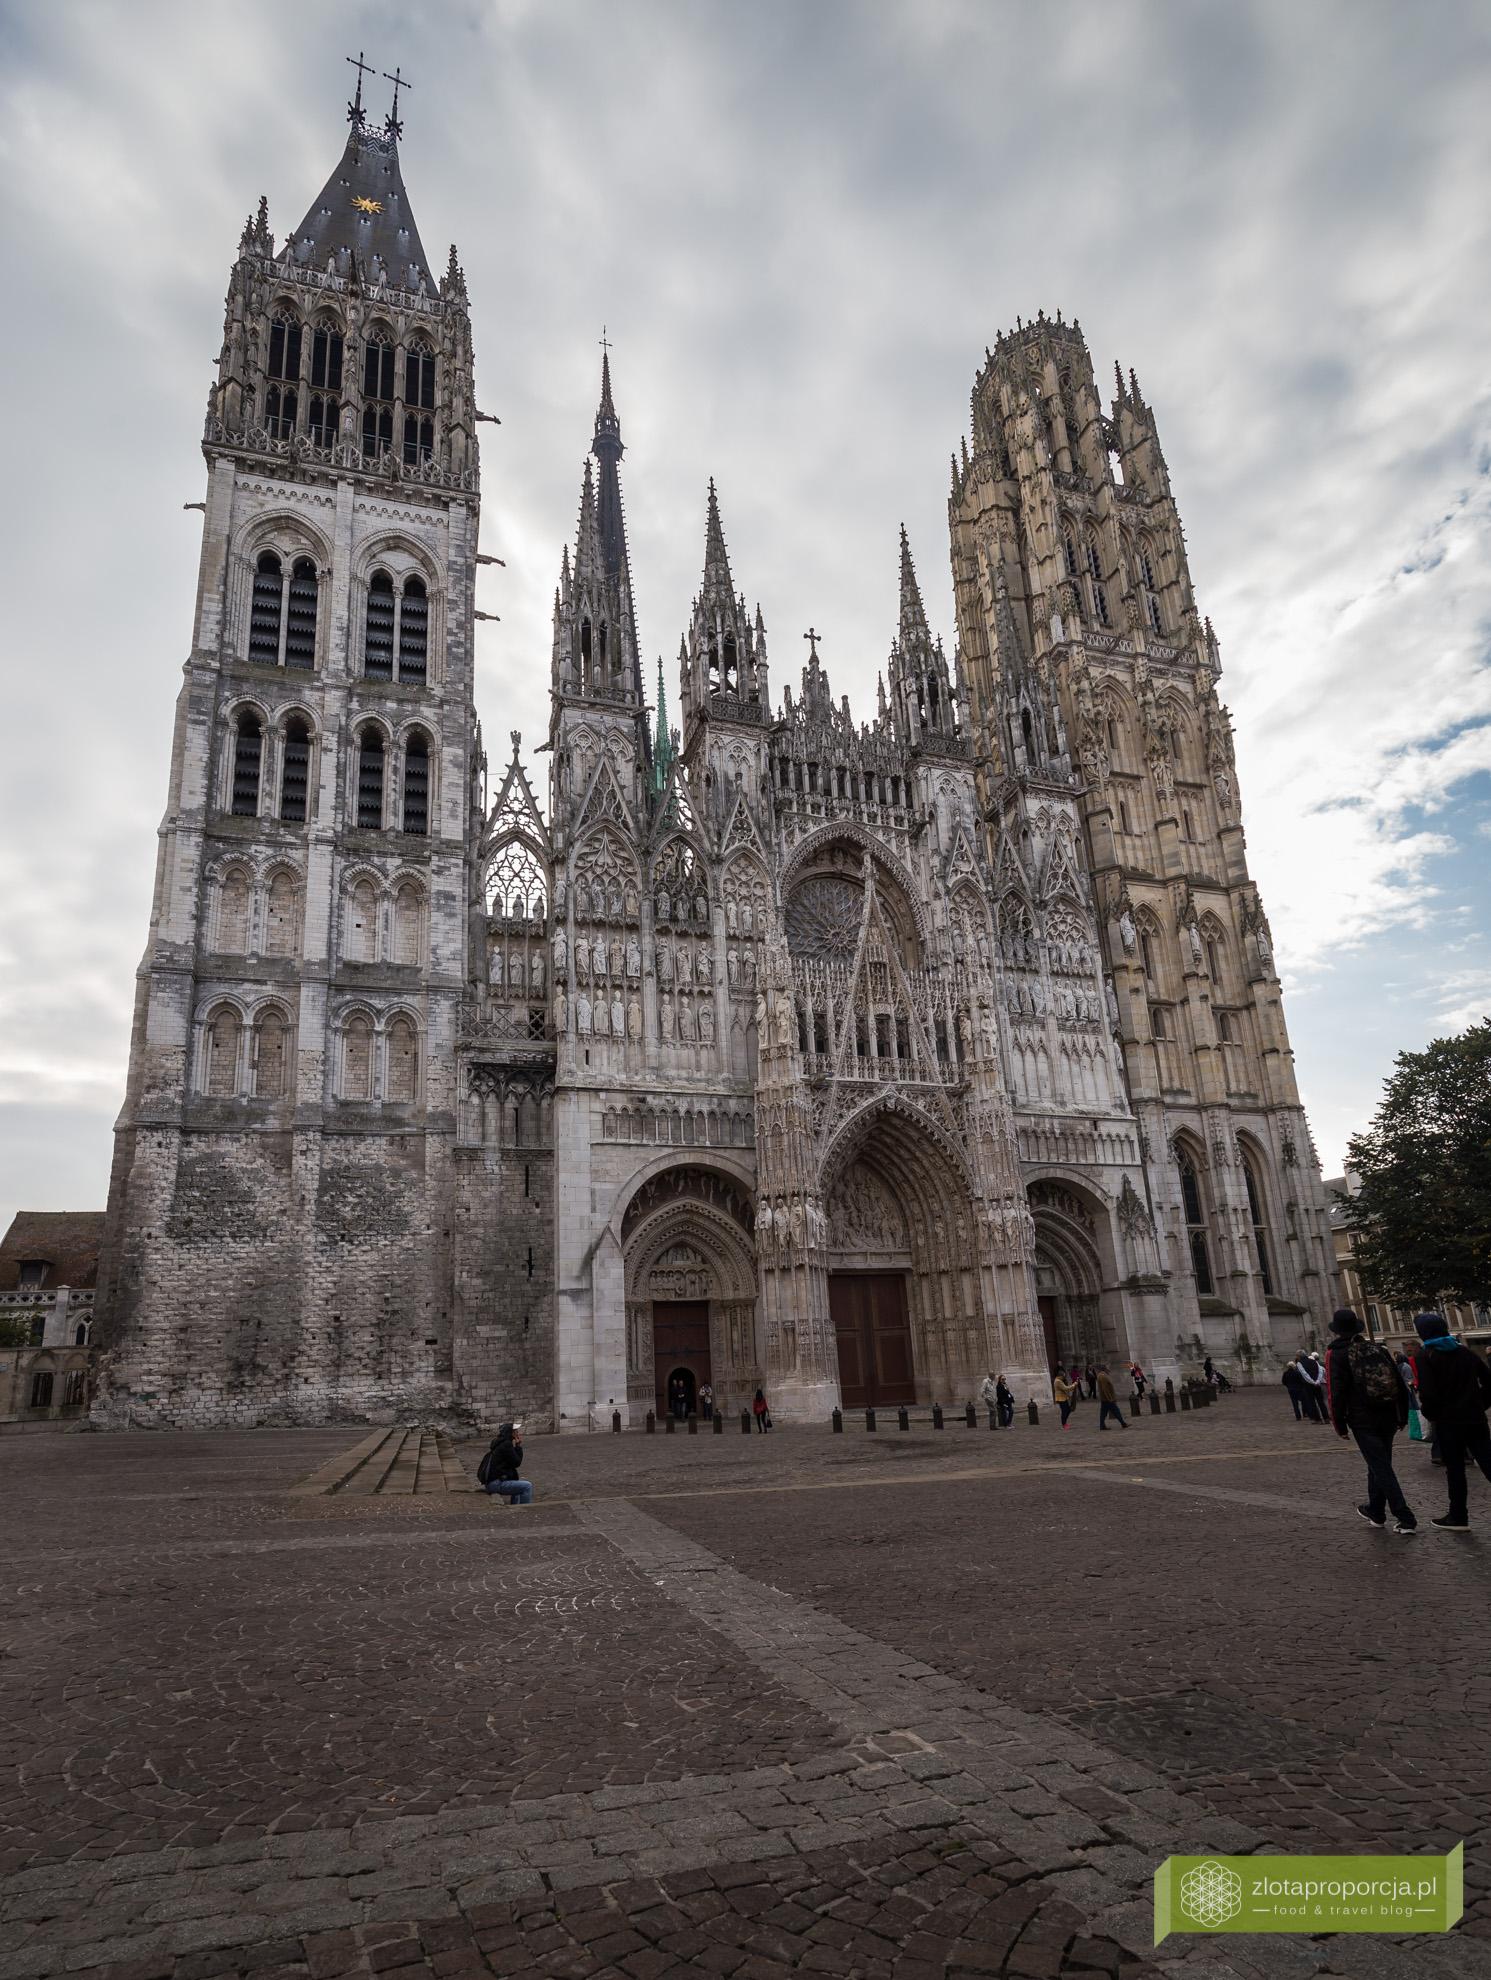 Rouen,vNormandia, atrakcje Rouen, atrakcje Normandii, Francja, katedra w Rouen